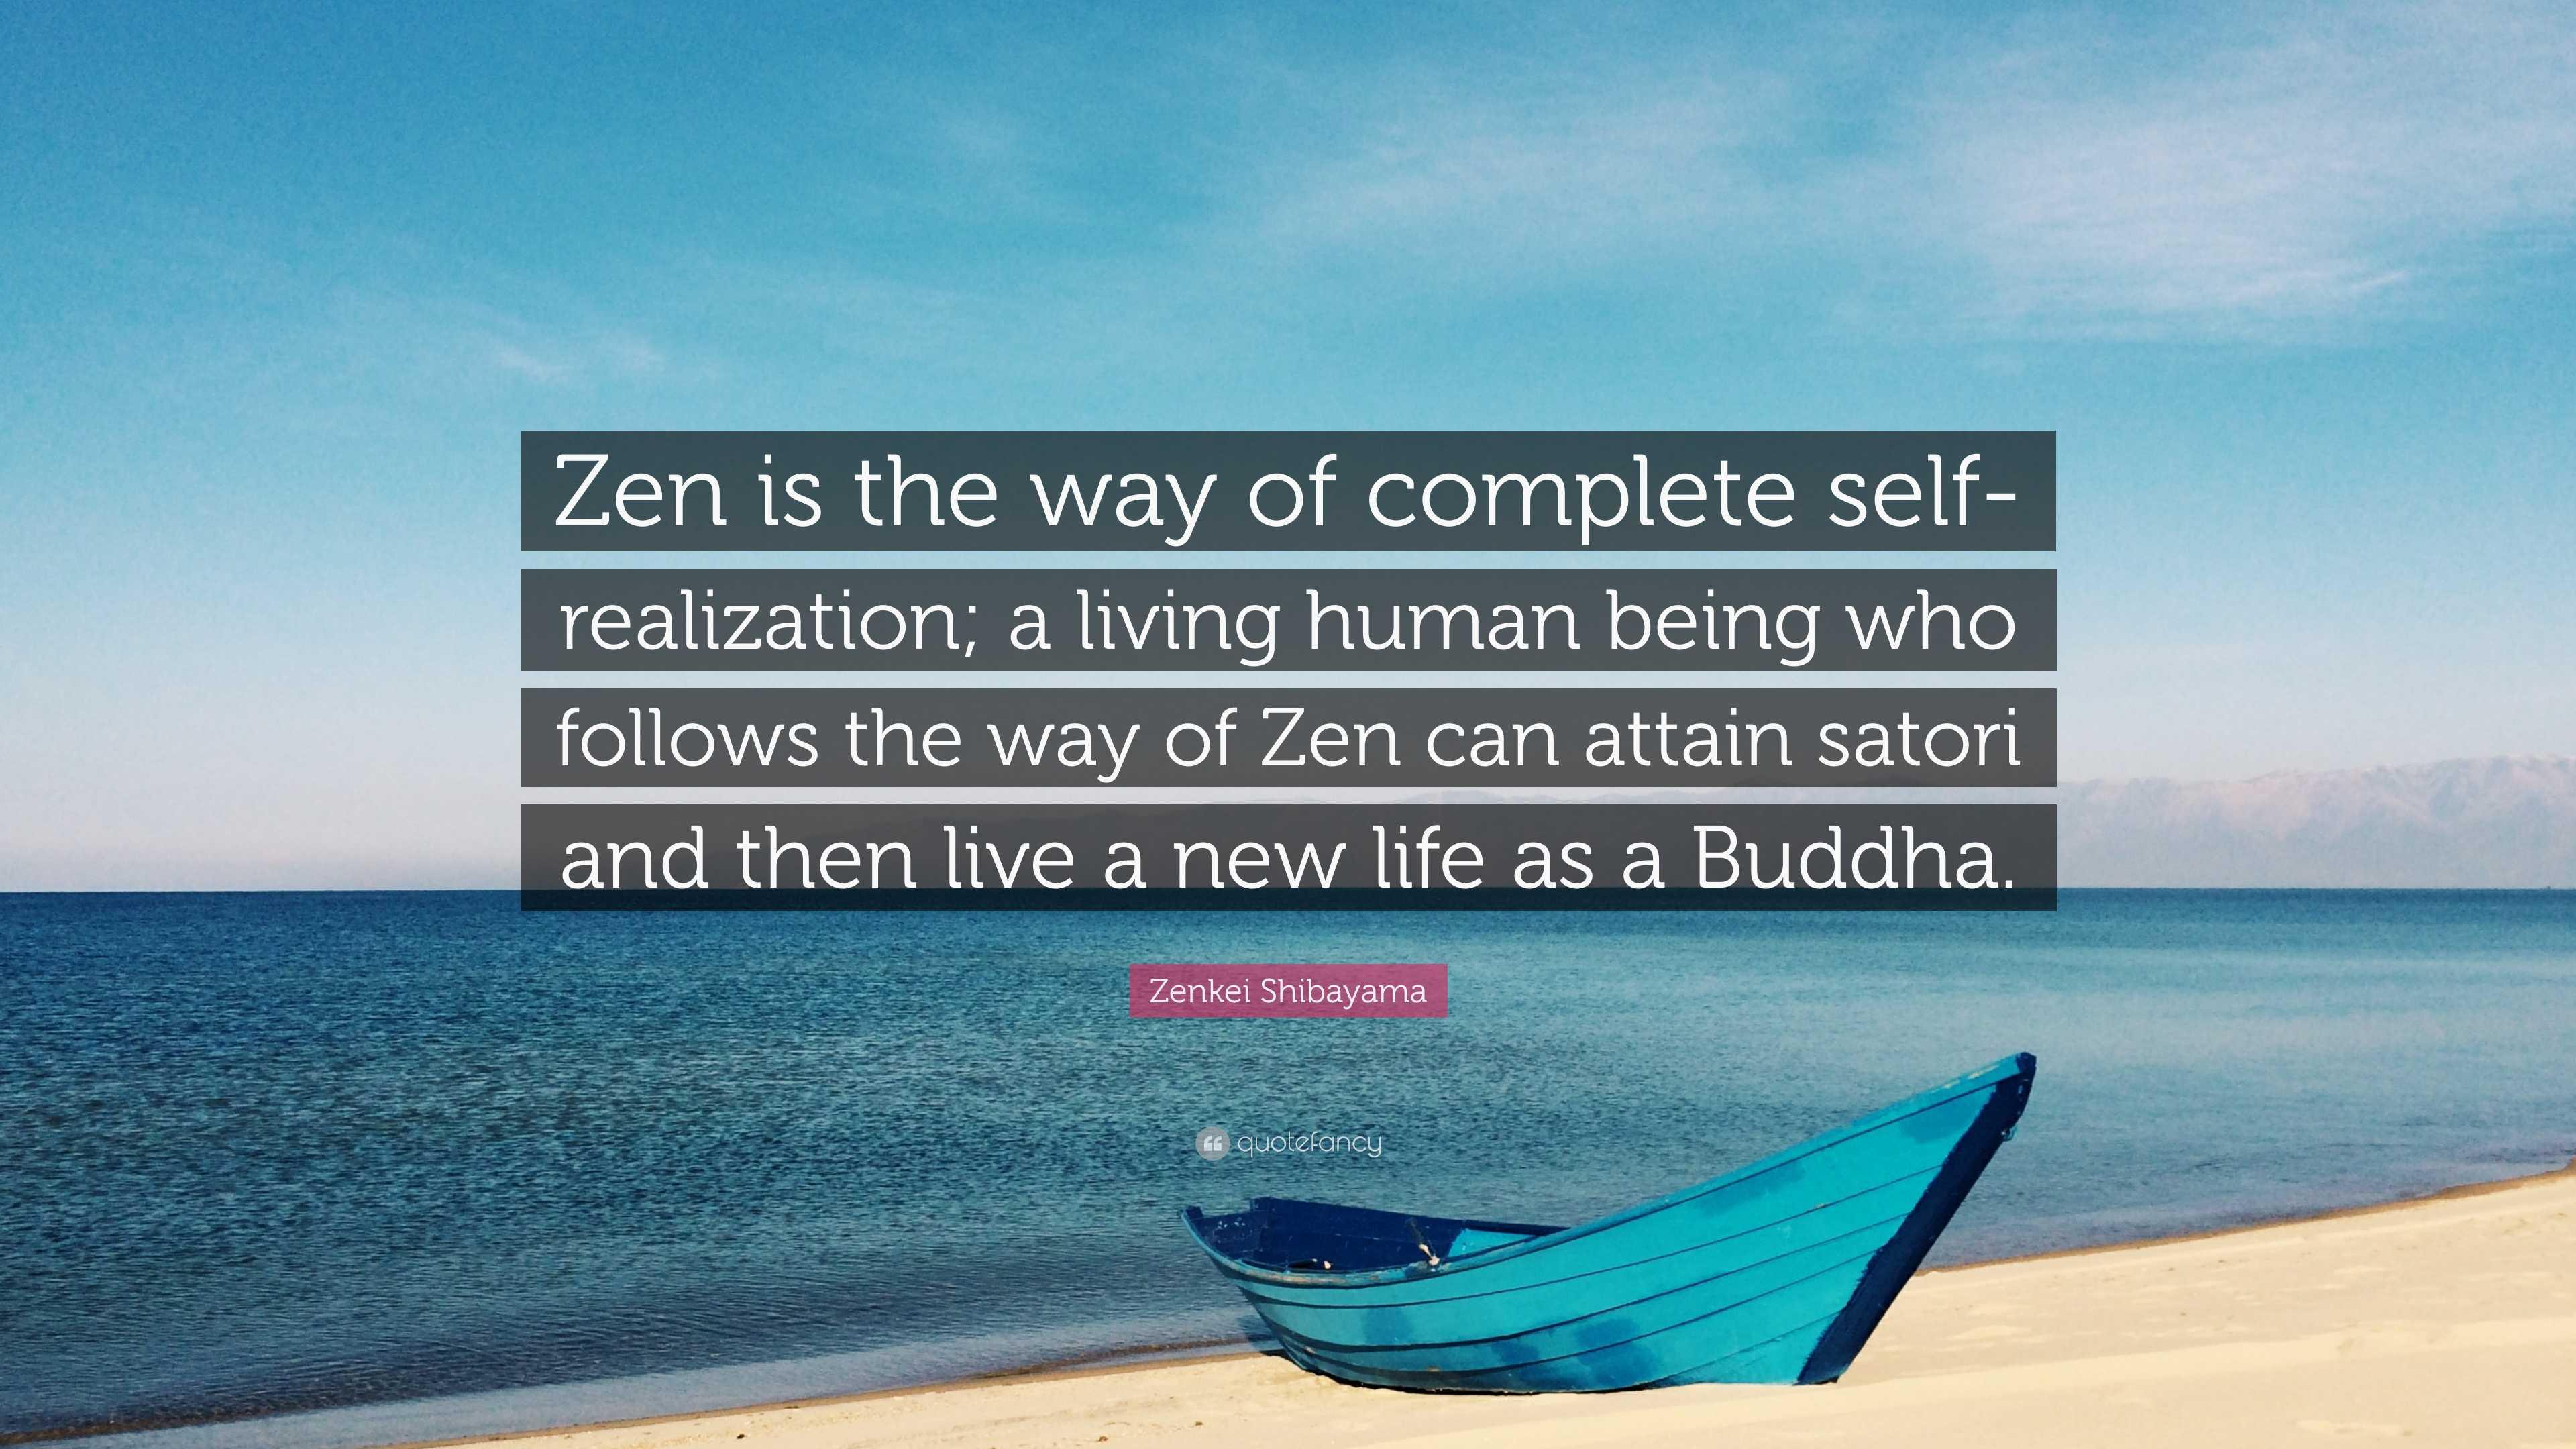 Zenkei Shibayama Quote Zen Is The Way Of Complete Self Realization